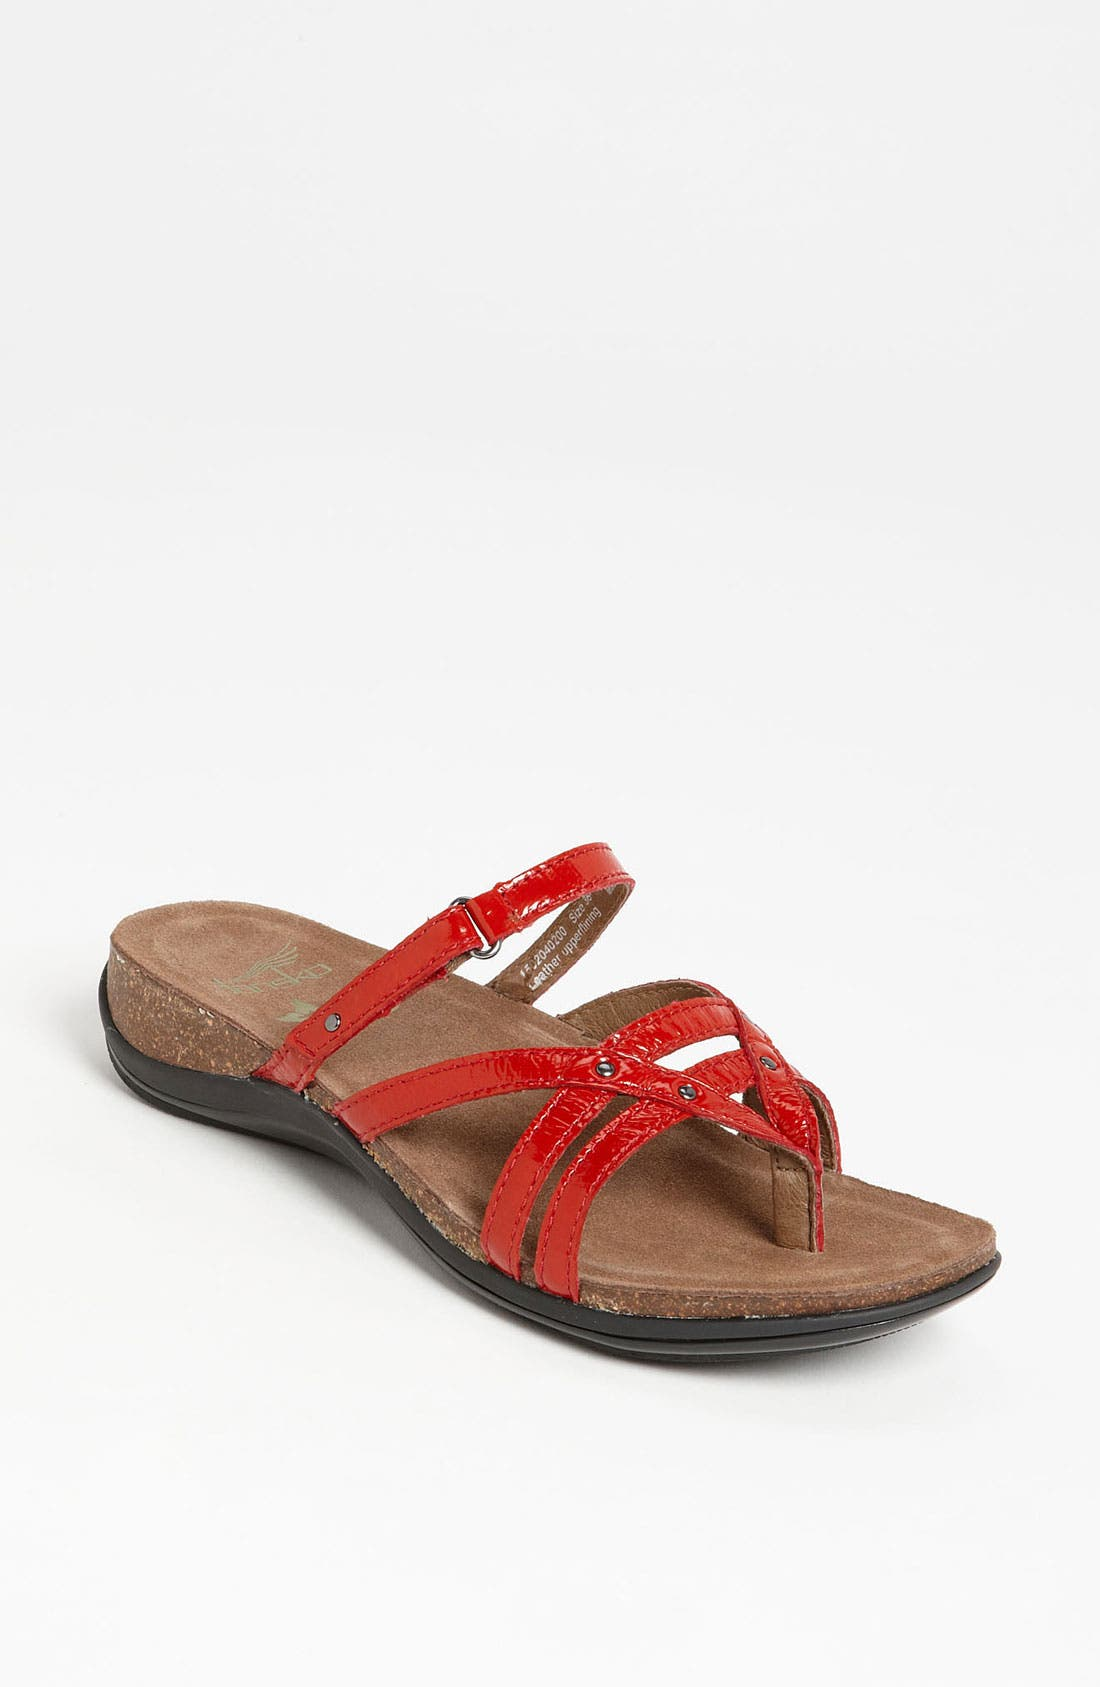 Main Image - Dansko 'Jenelle' Sandal